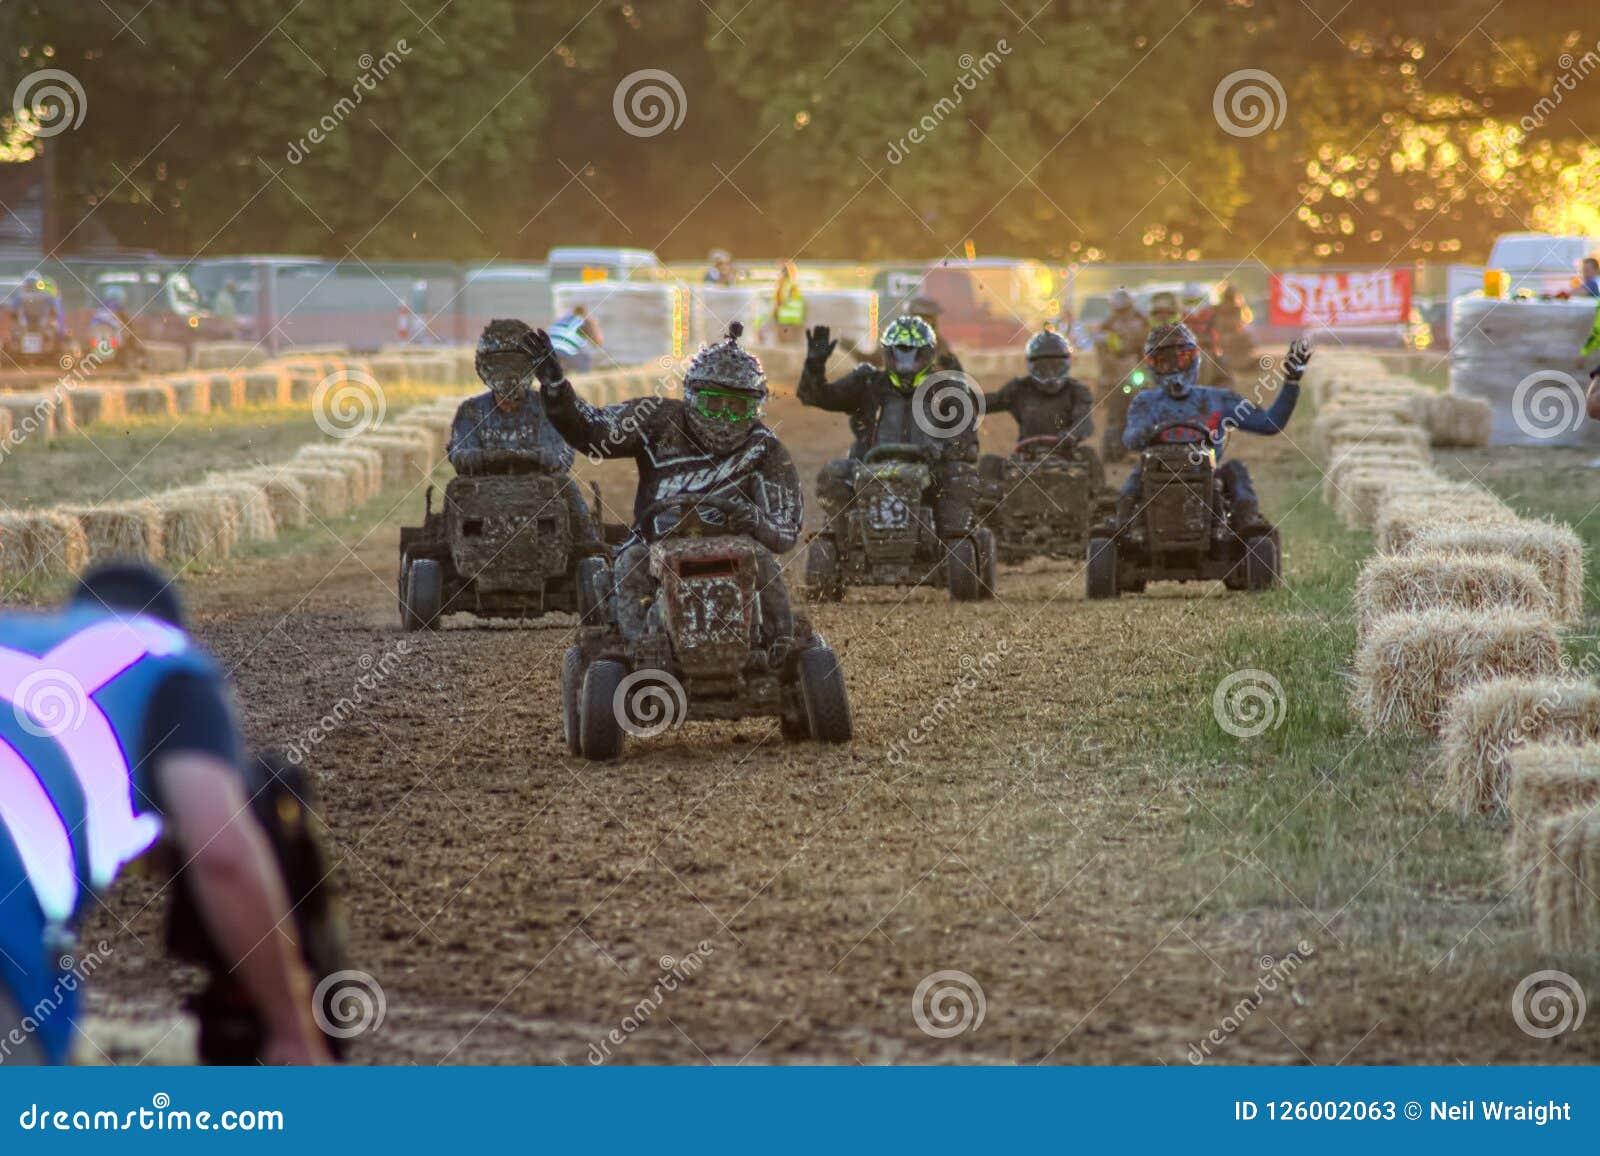 Lawn Mower Racing >> Lawn Mower Racing Editorial Stock Photo Image Of Healthcare